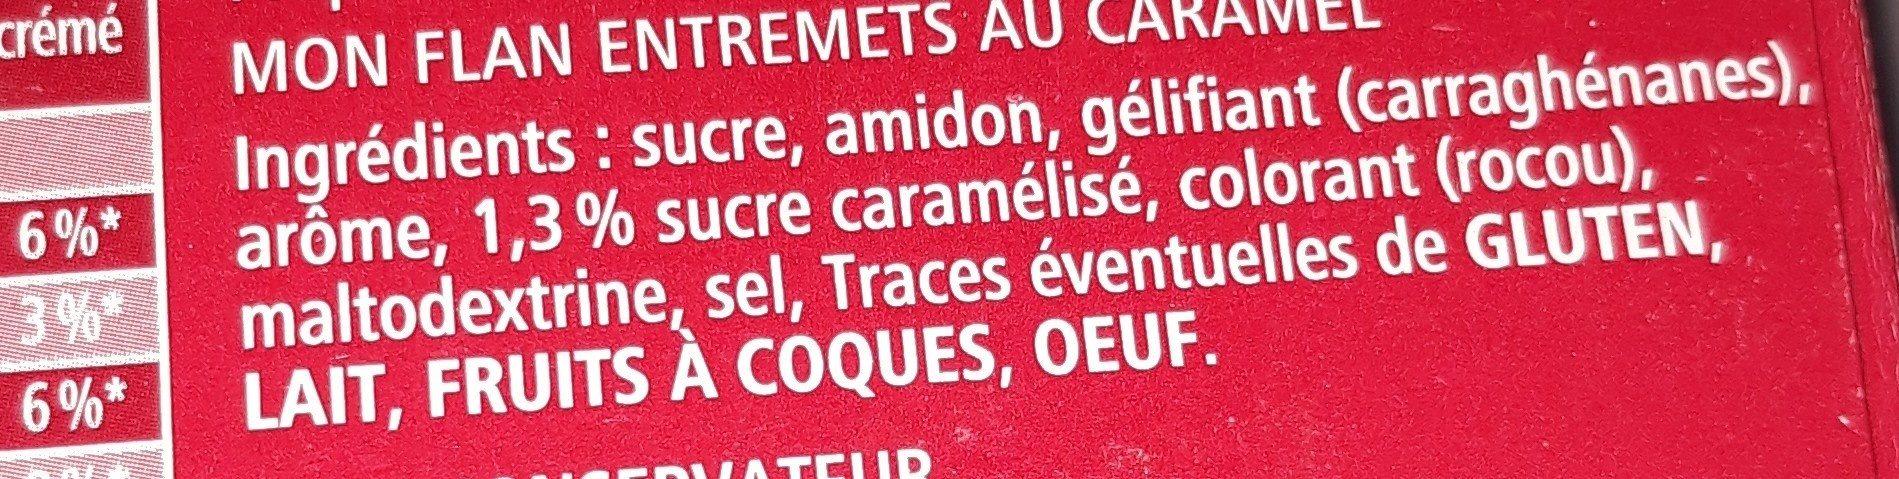 Mon Flan Entremets au Caramel - Ingredients - fr